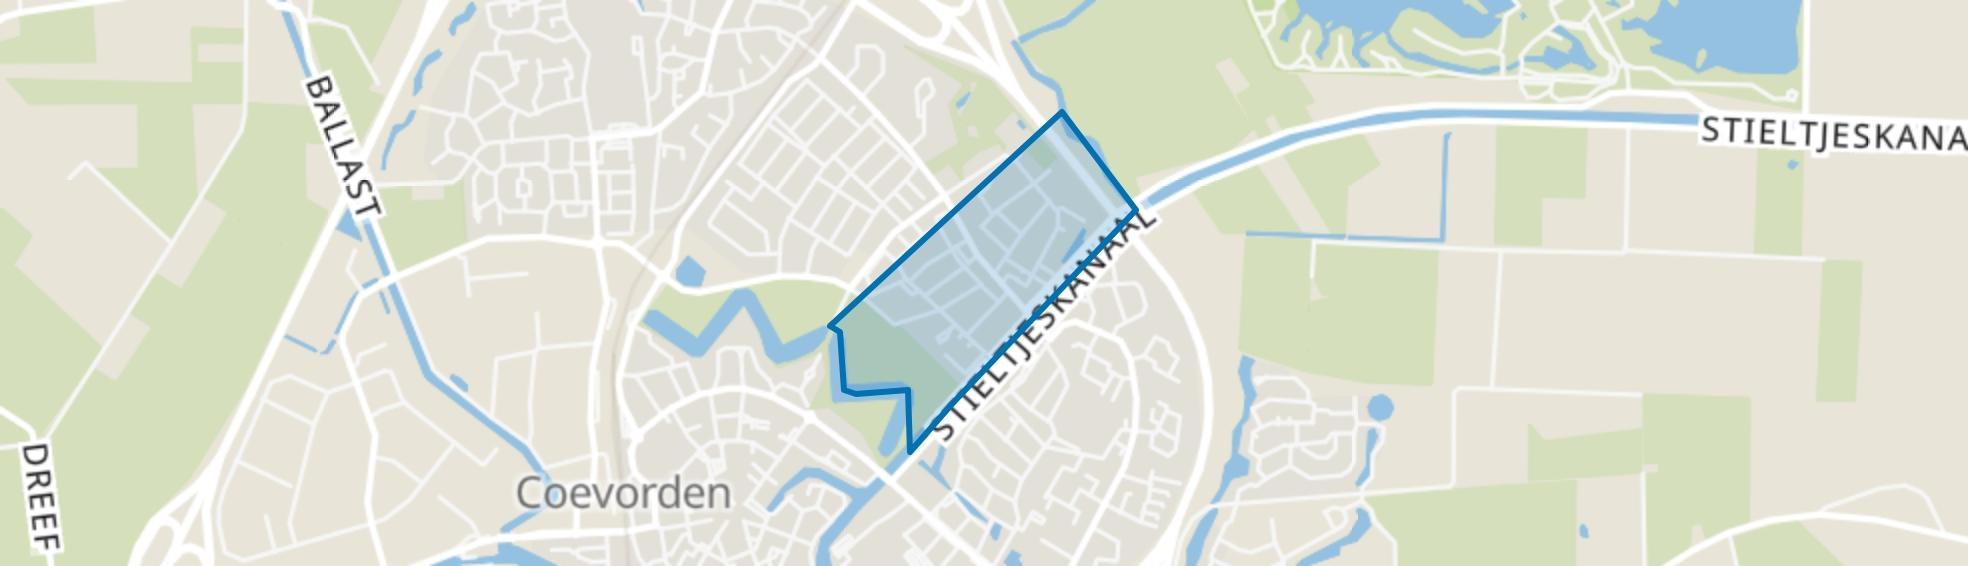 Poppenhare, Coevorden map